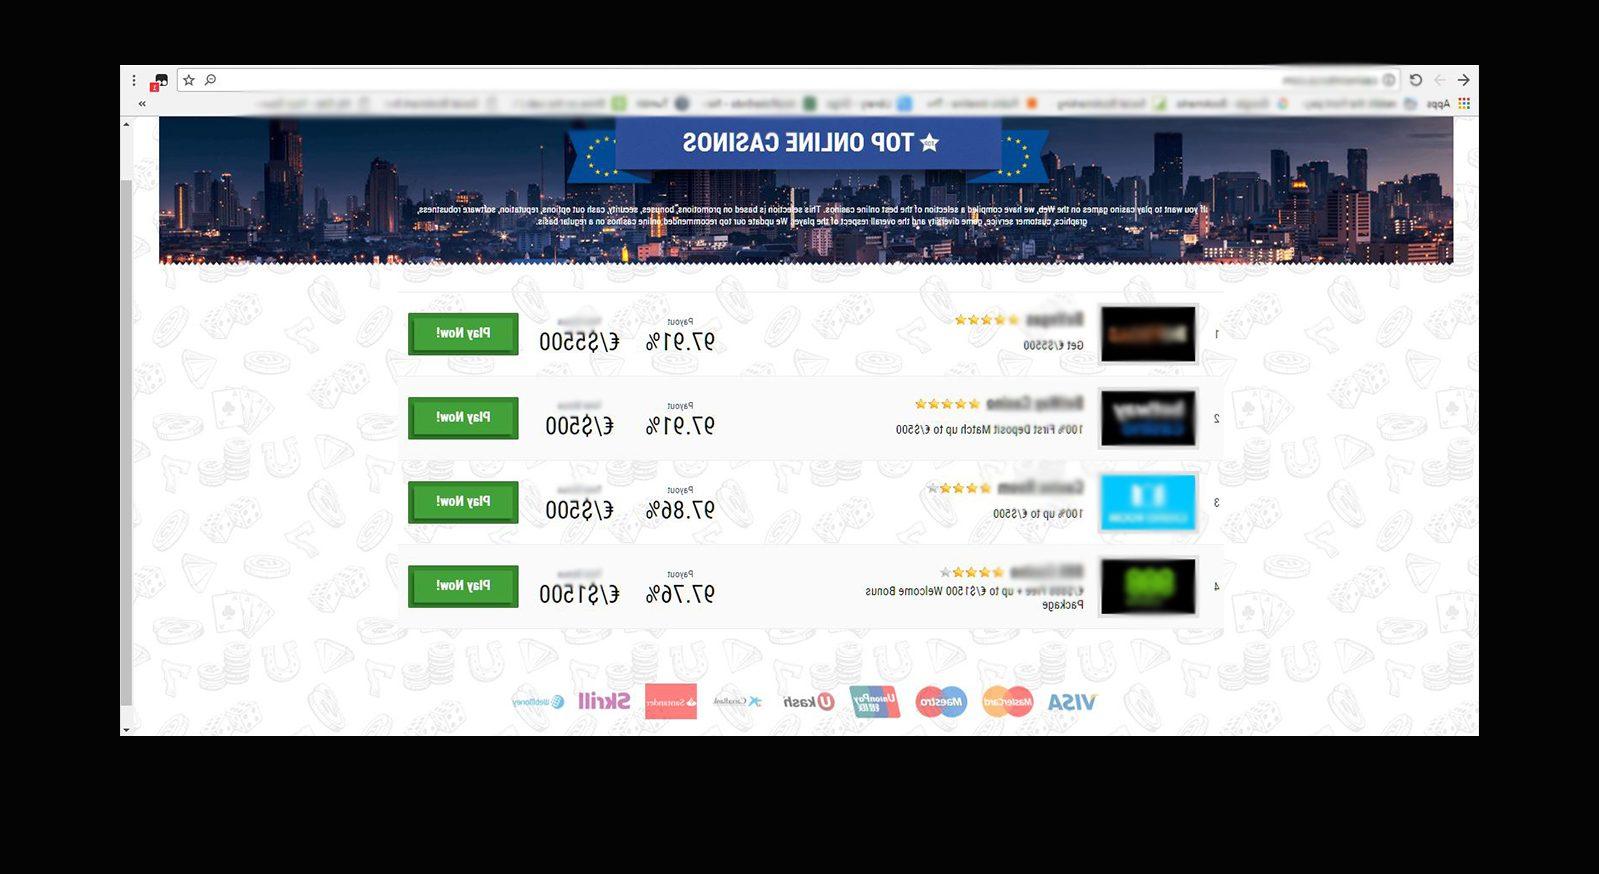 Situs Poker Online Paling Murah Terpercaya Indonesia